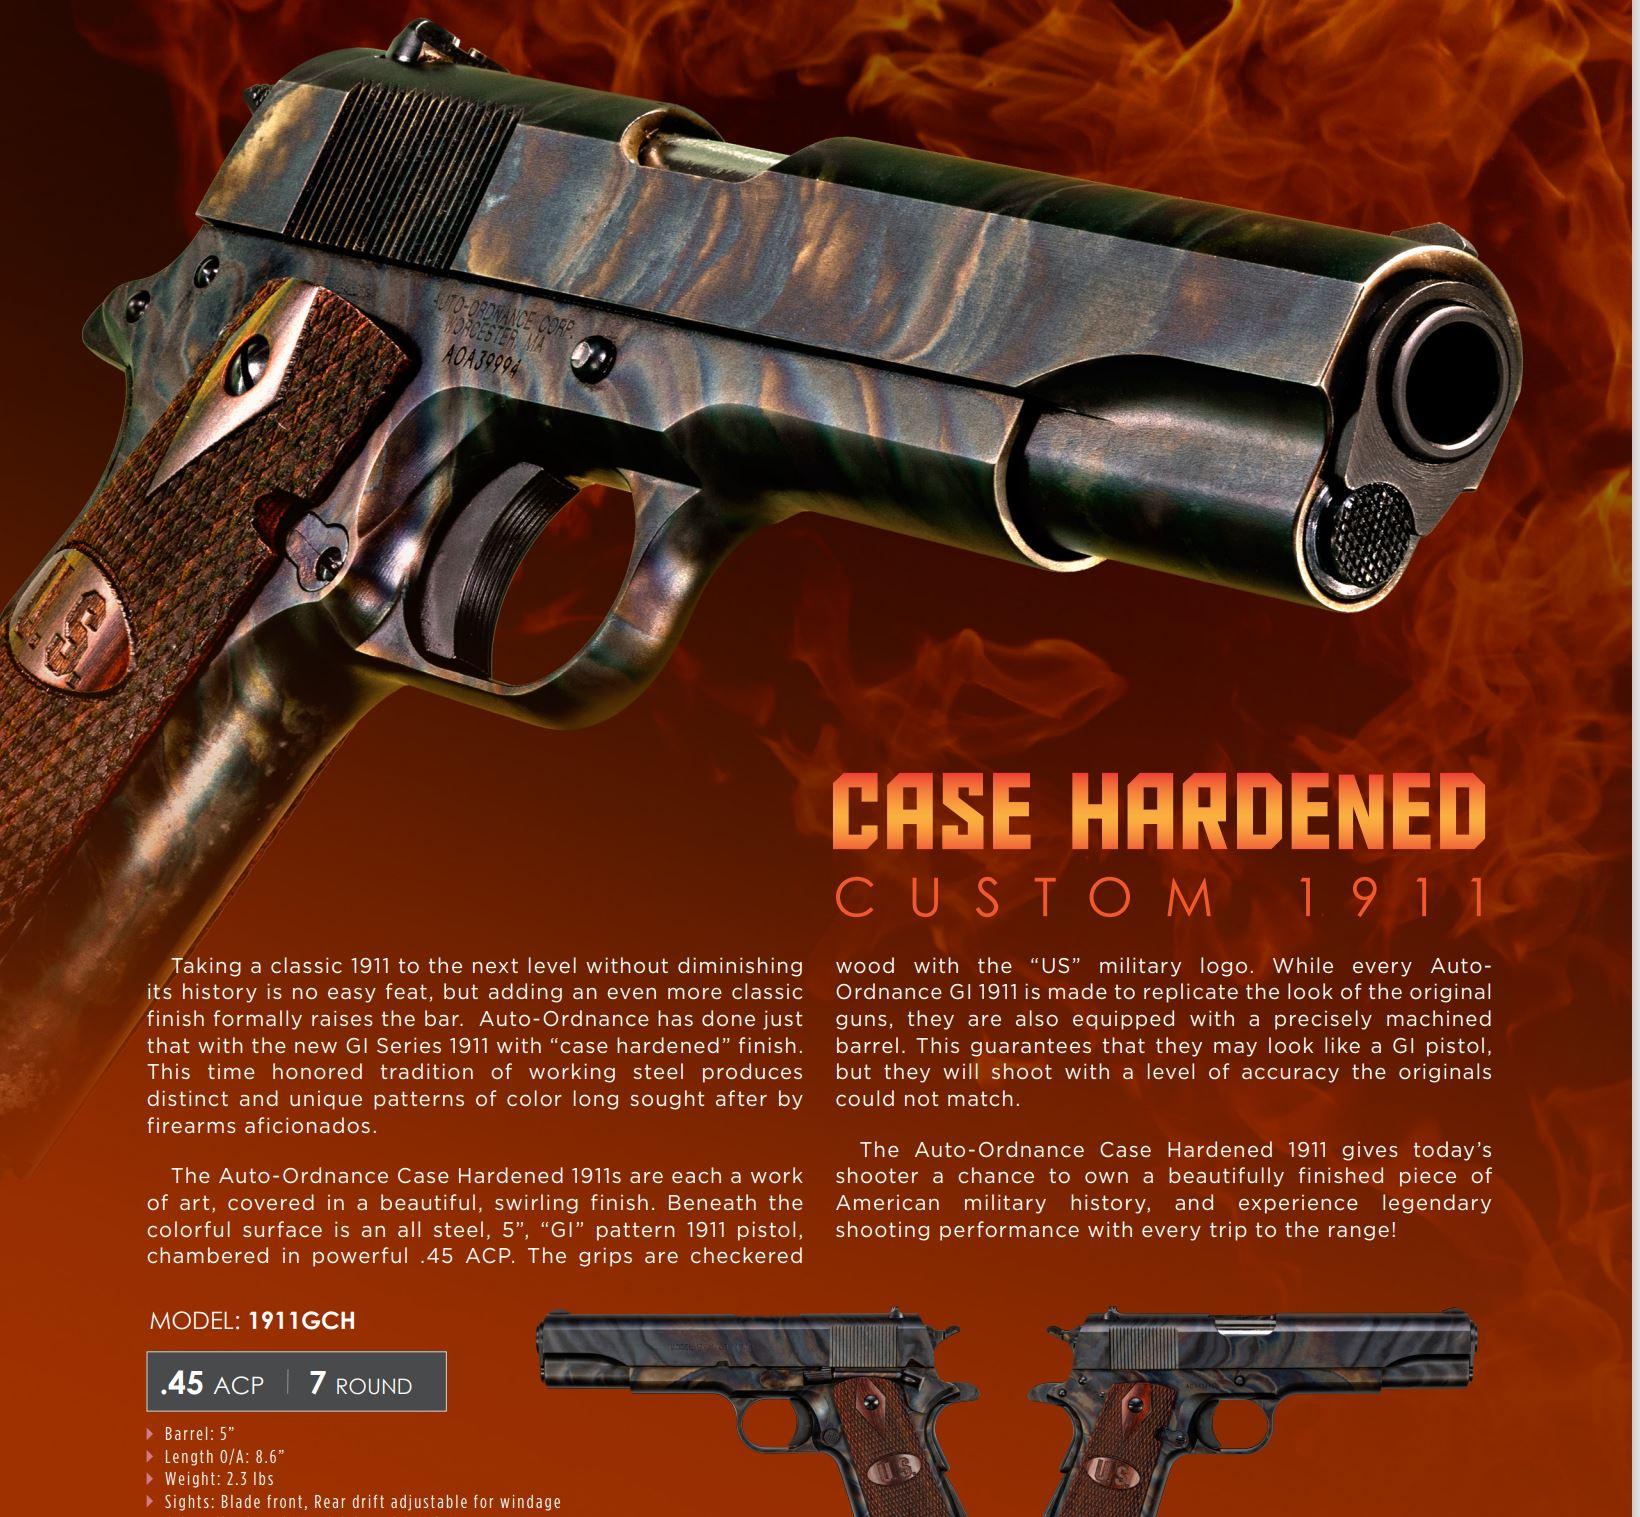 https://www.argunsammo.com/products/handguns-thompson-1911gch-602686421942-4106